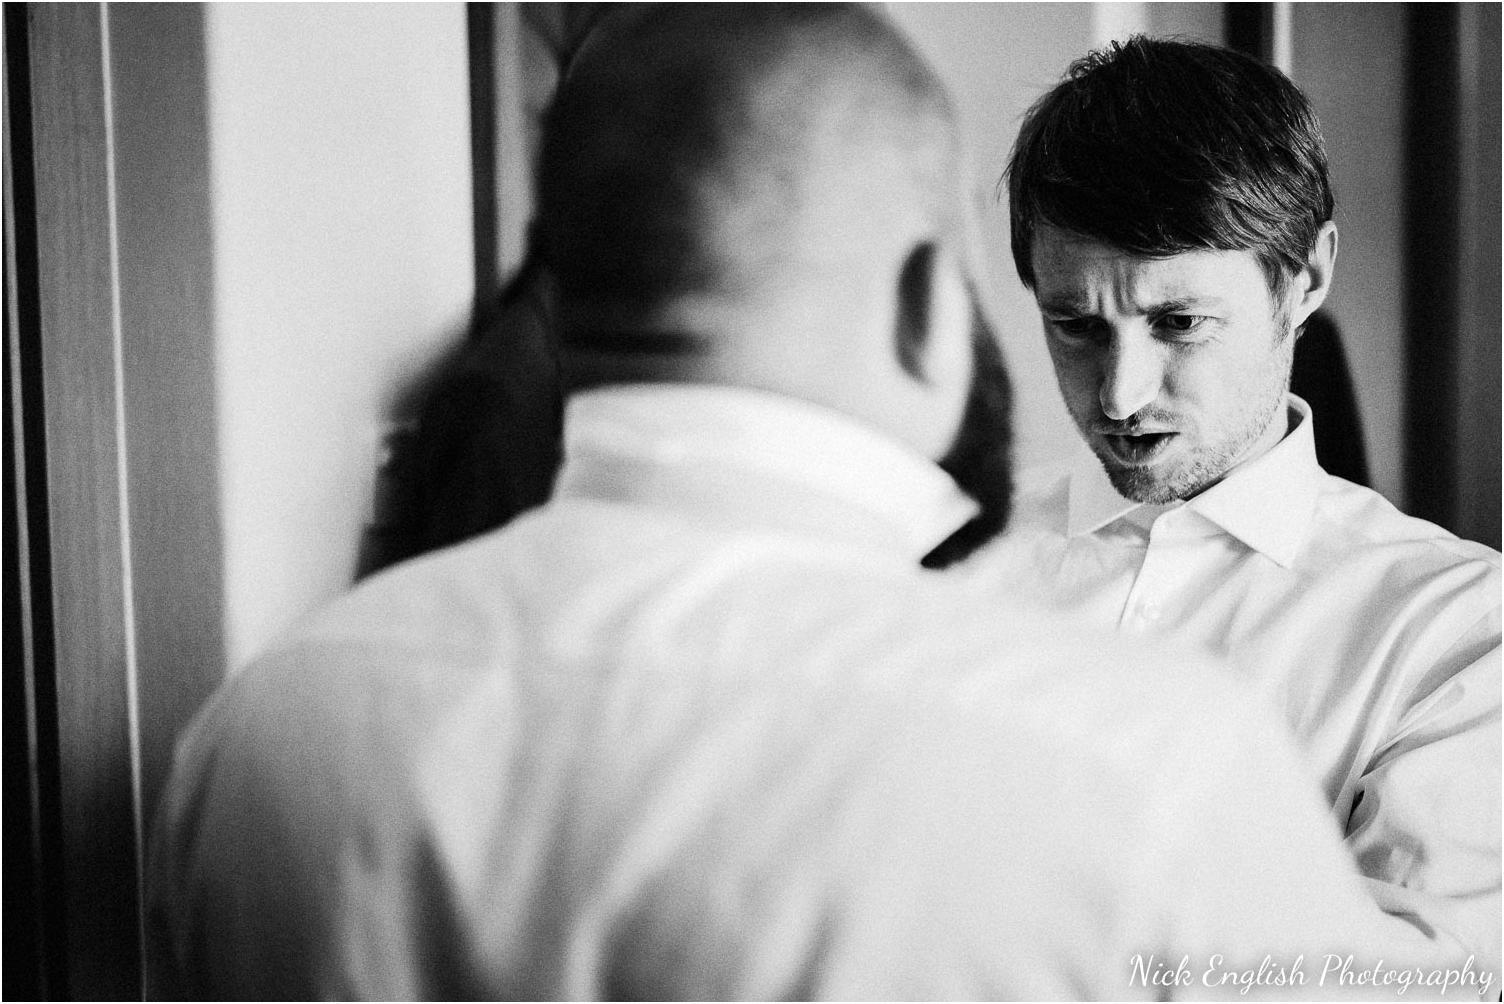 Destination_Wedding_Photographer_Slovenia_Nick_English_Photography-20.jpg